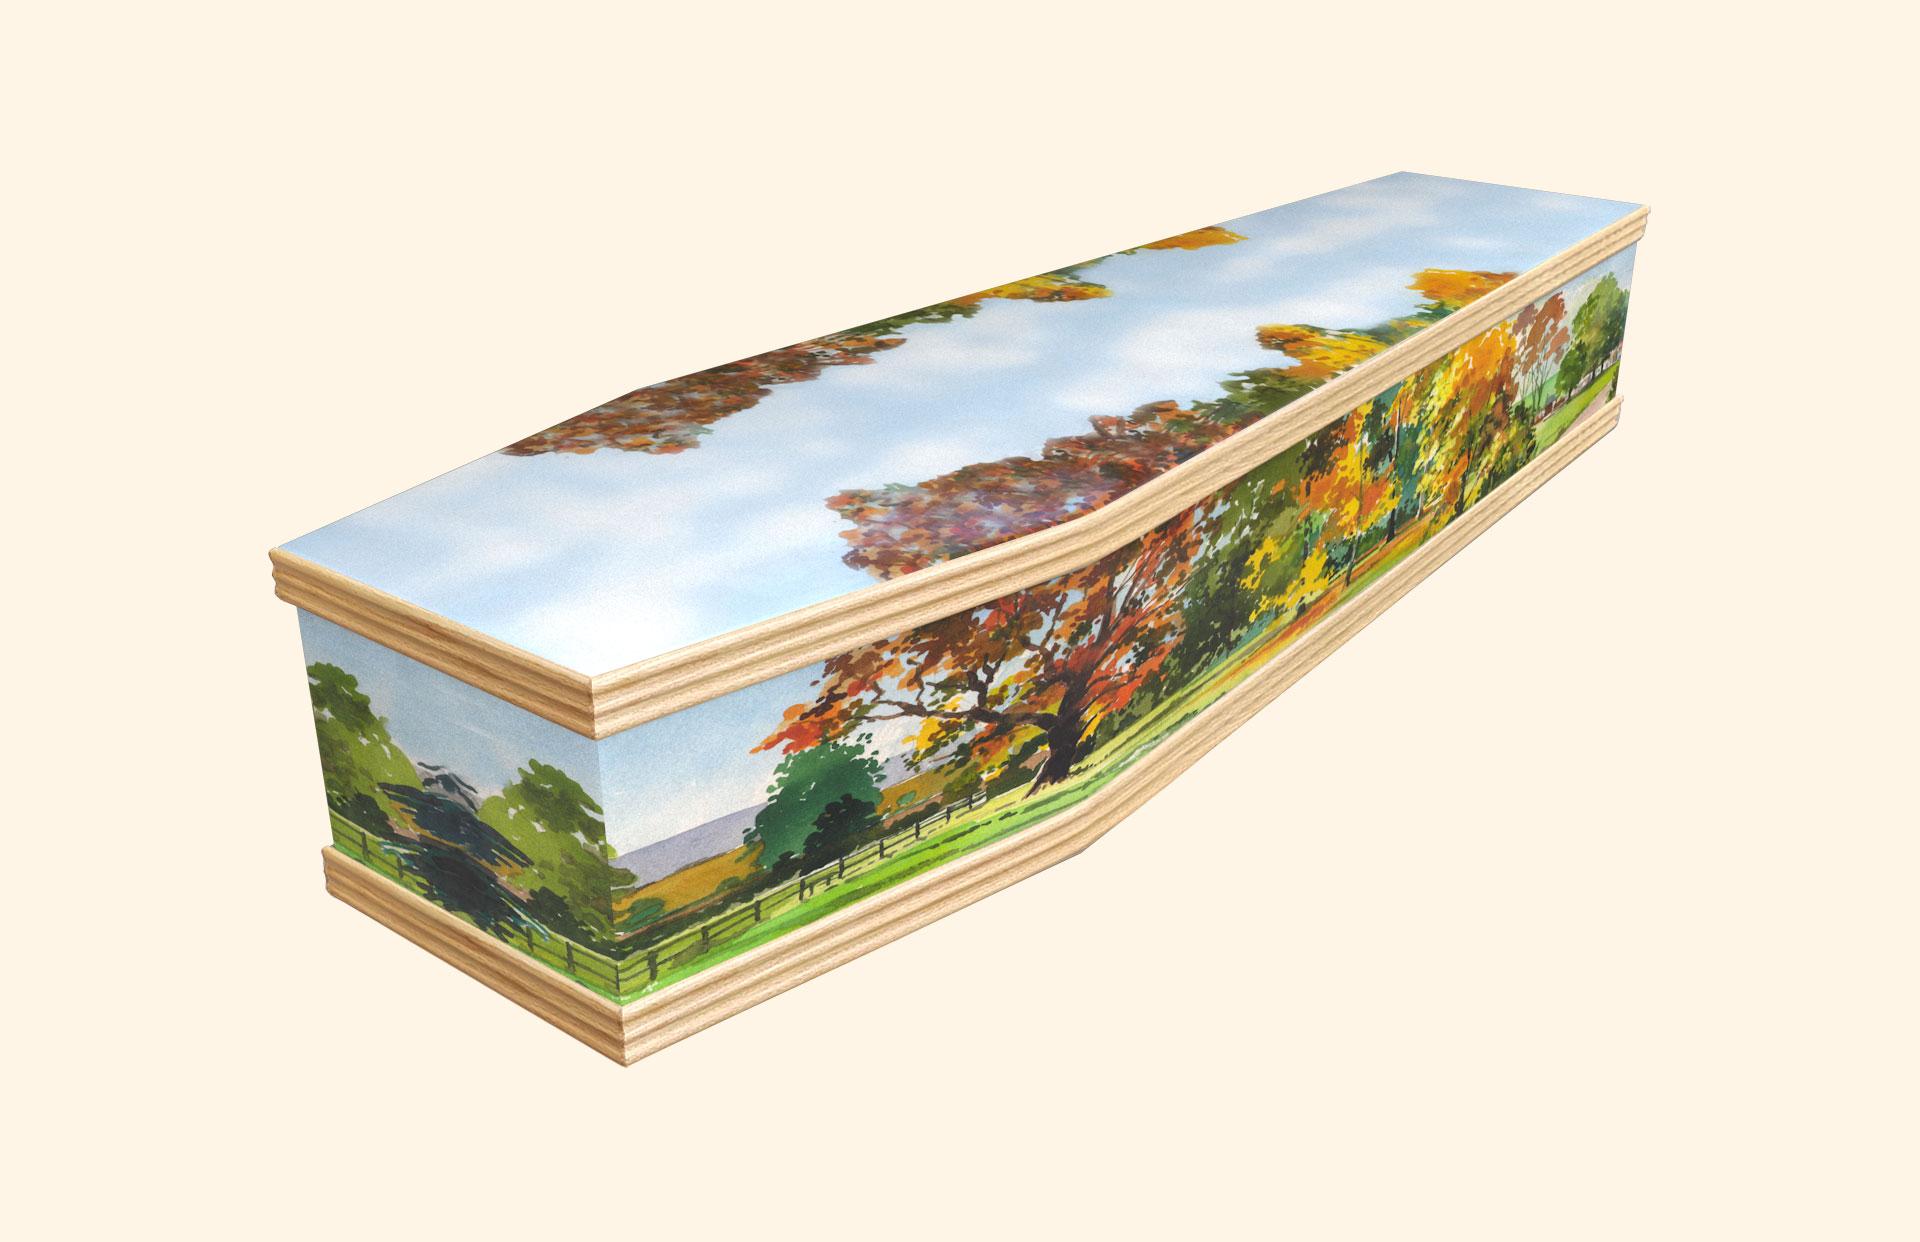 Autumn design on a classic coffin